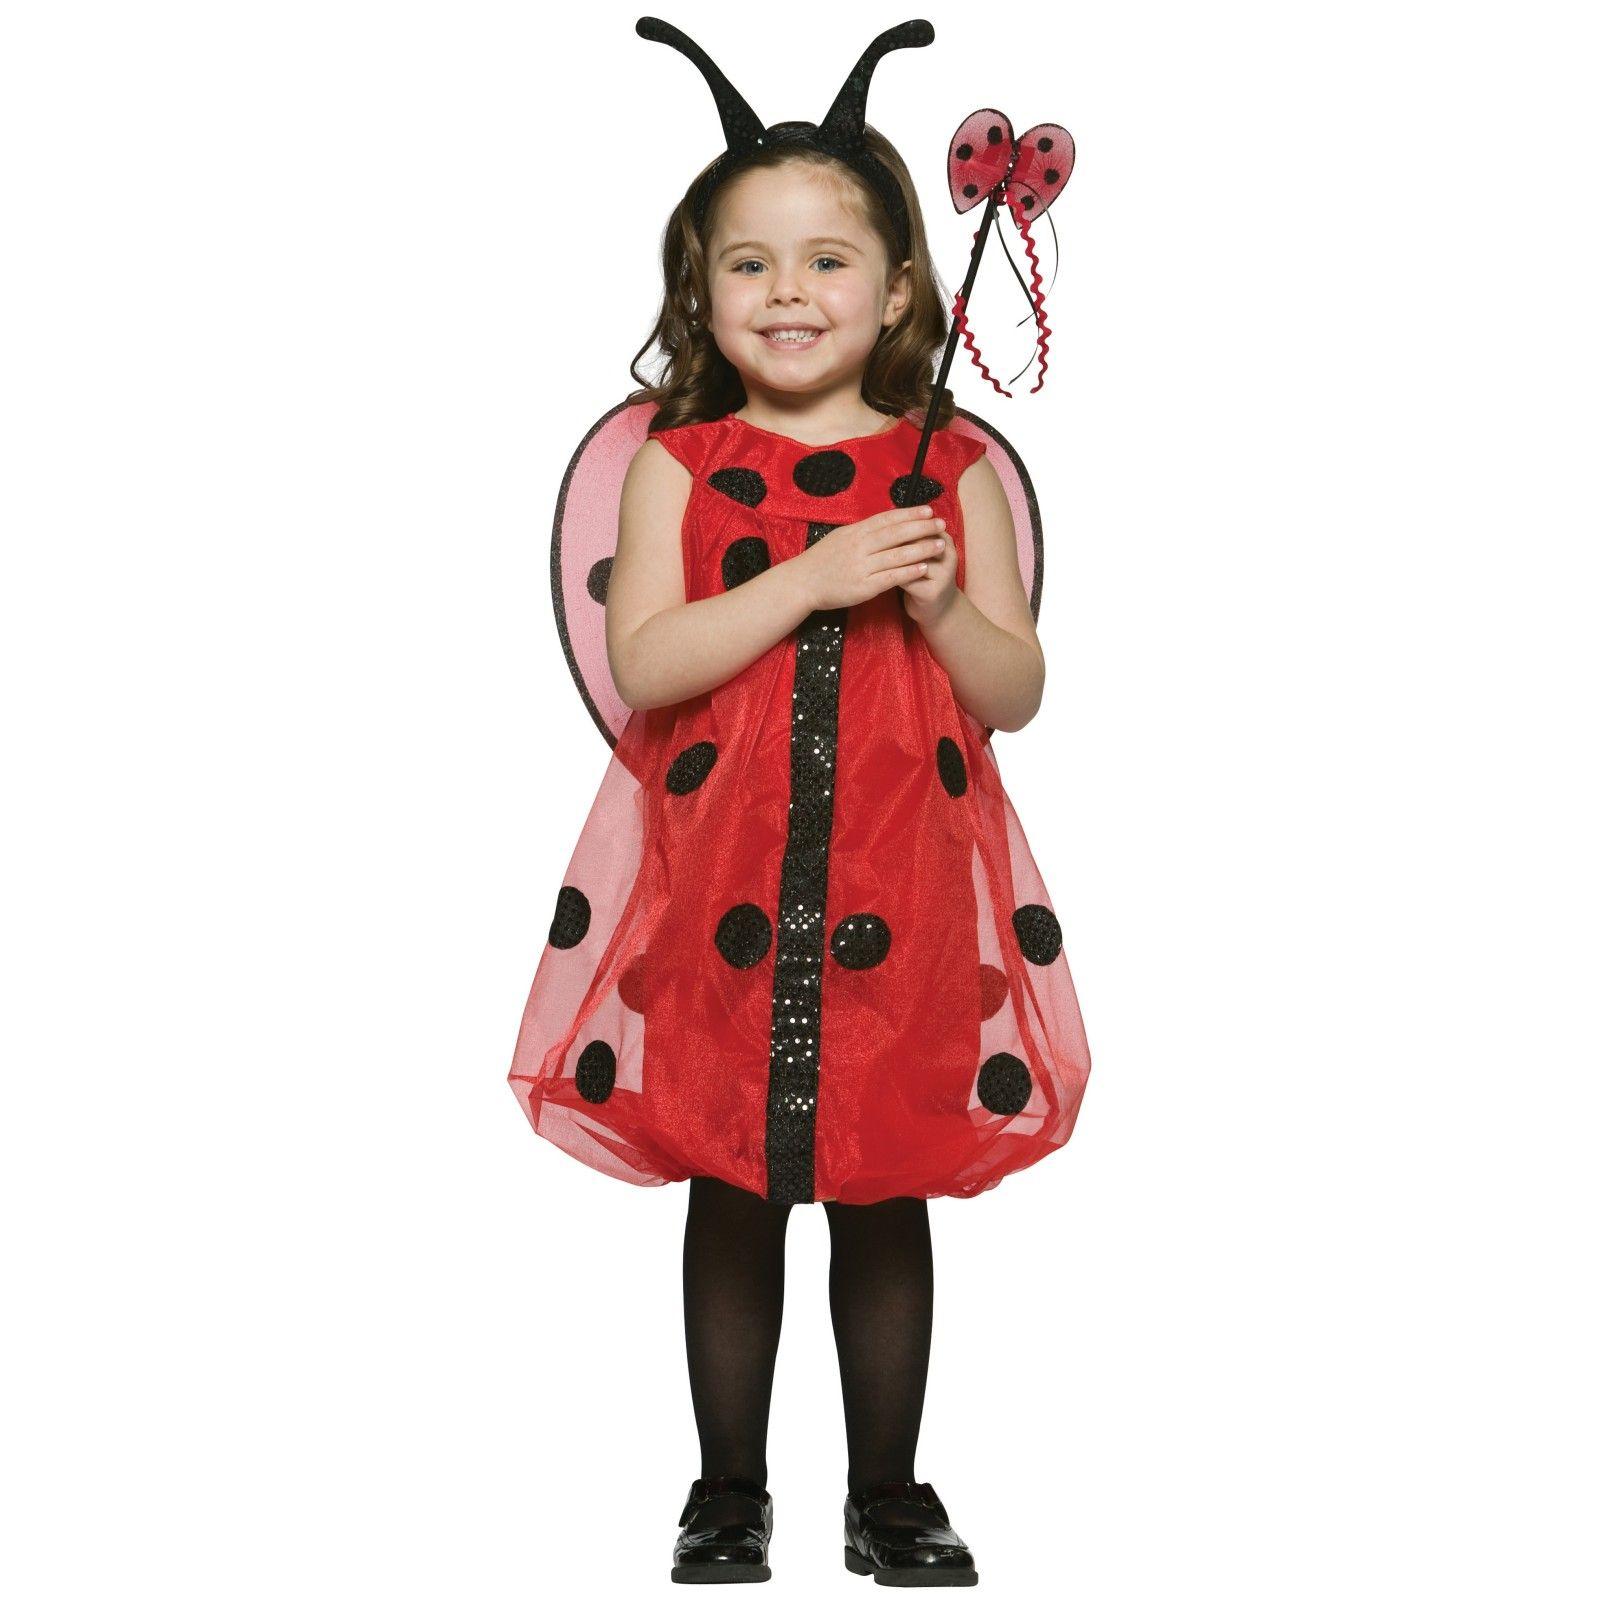 Ladybug Costume Child   Endroits à visiter   Pinterest 884889640f64